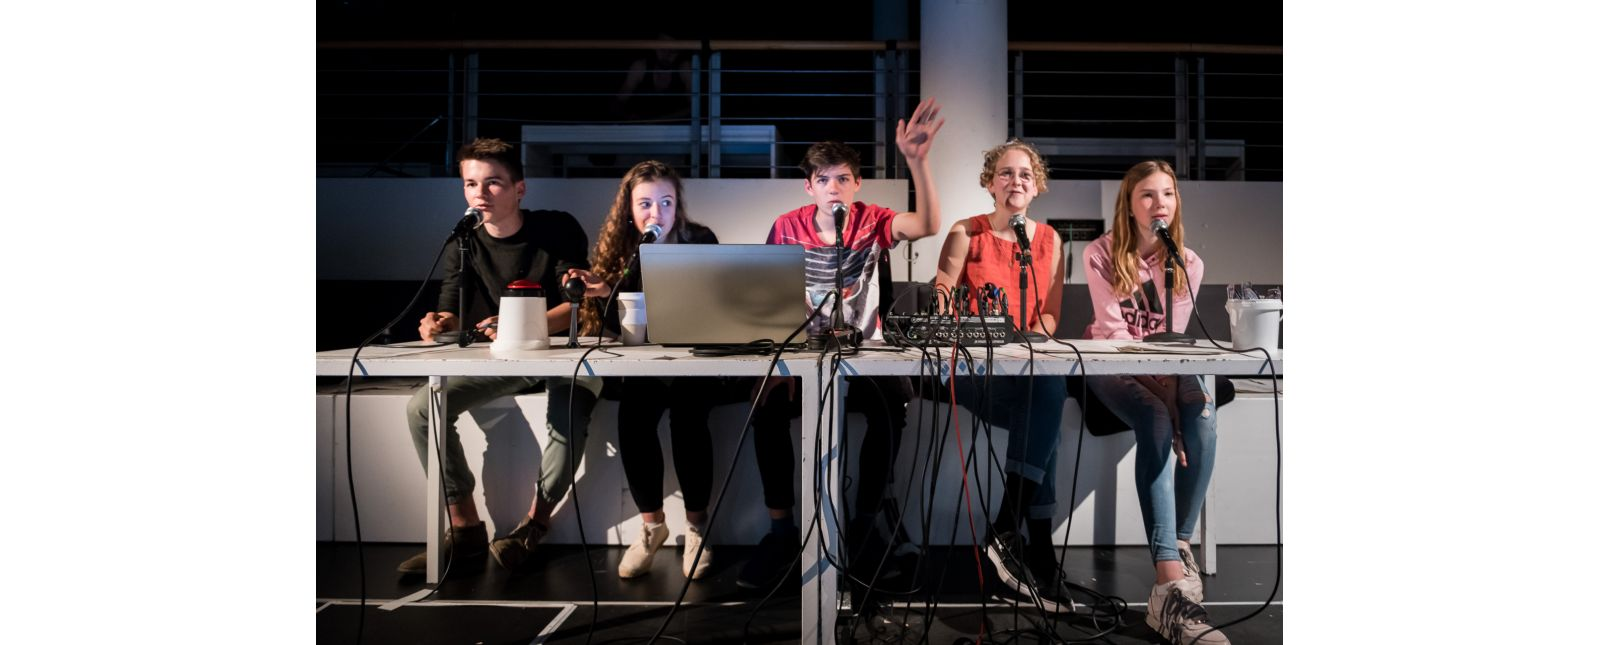 Das Leben des Anderen // Timon Roosen // Malika Scheller // Noah Menzinger // Teresa Jägle // Charlotte Wunderlich 2019 // Foto: Marc Doradzillo